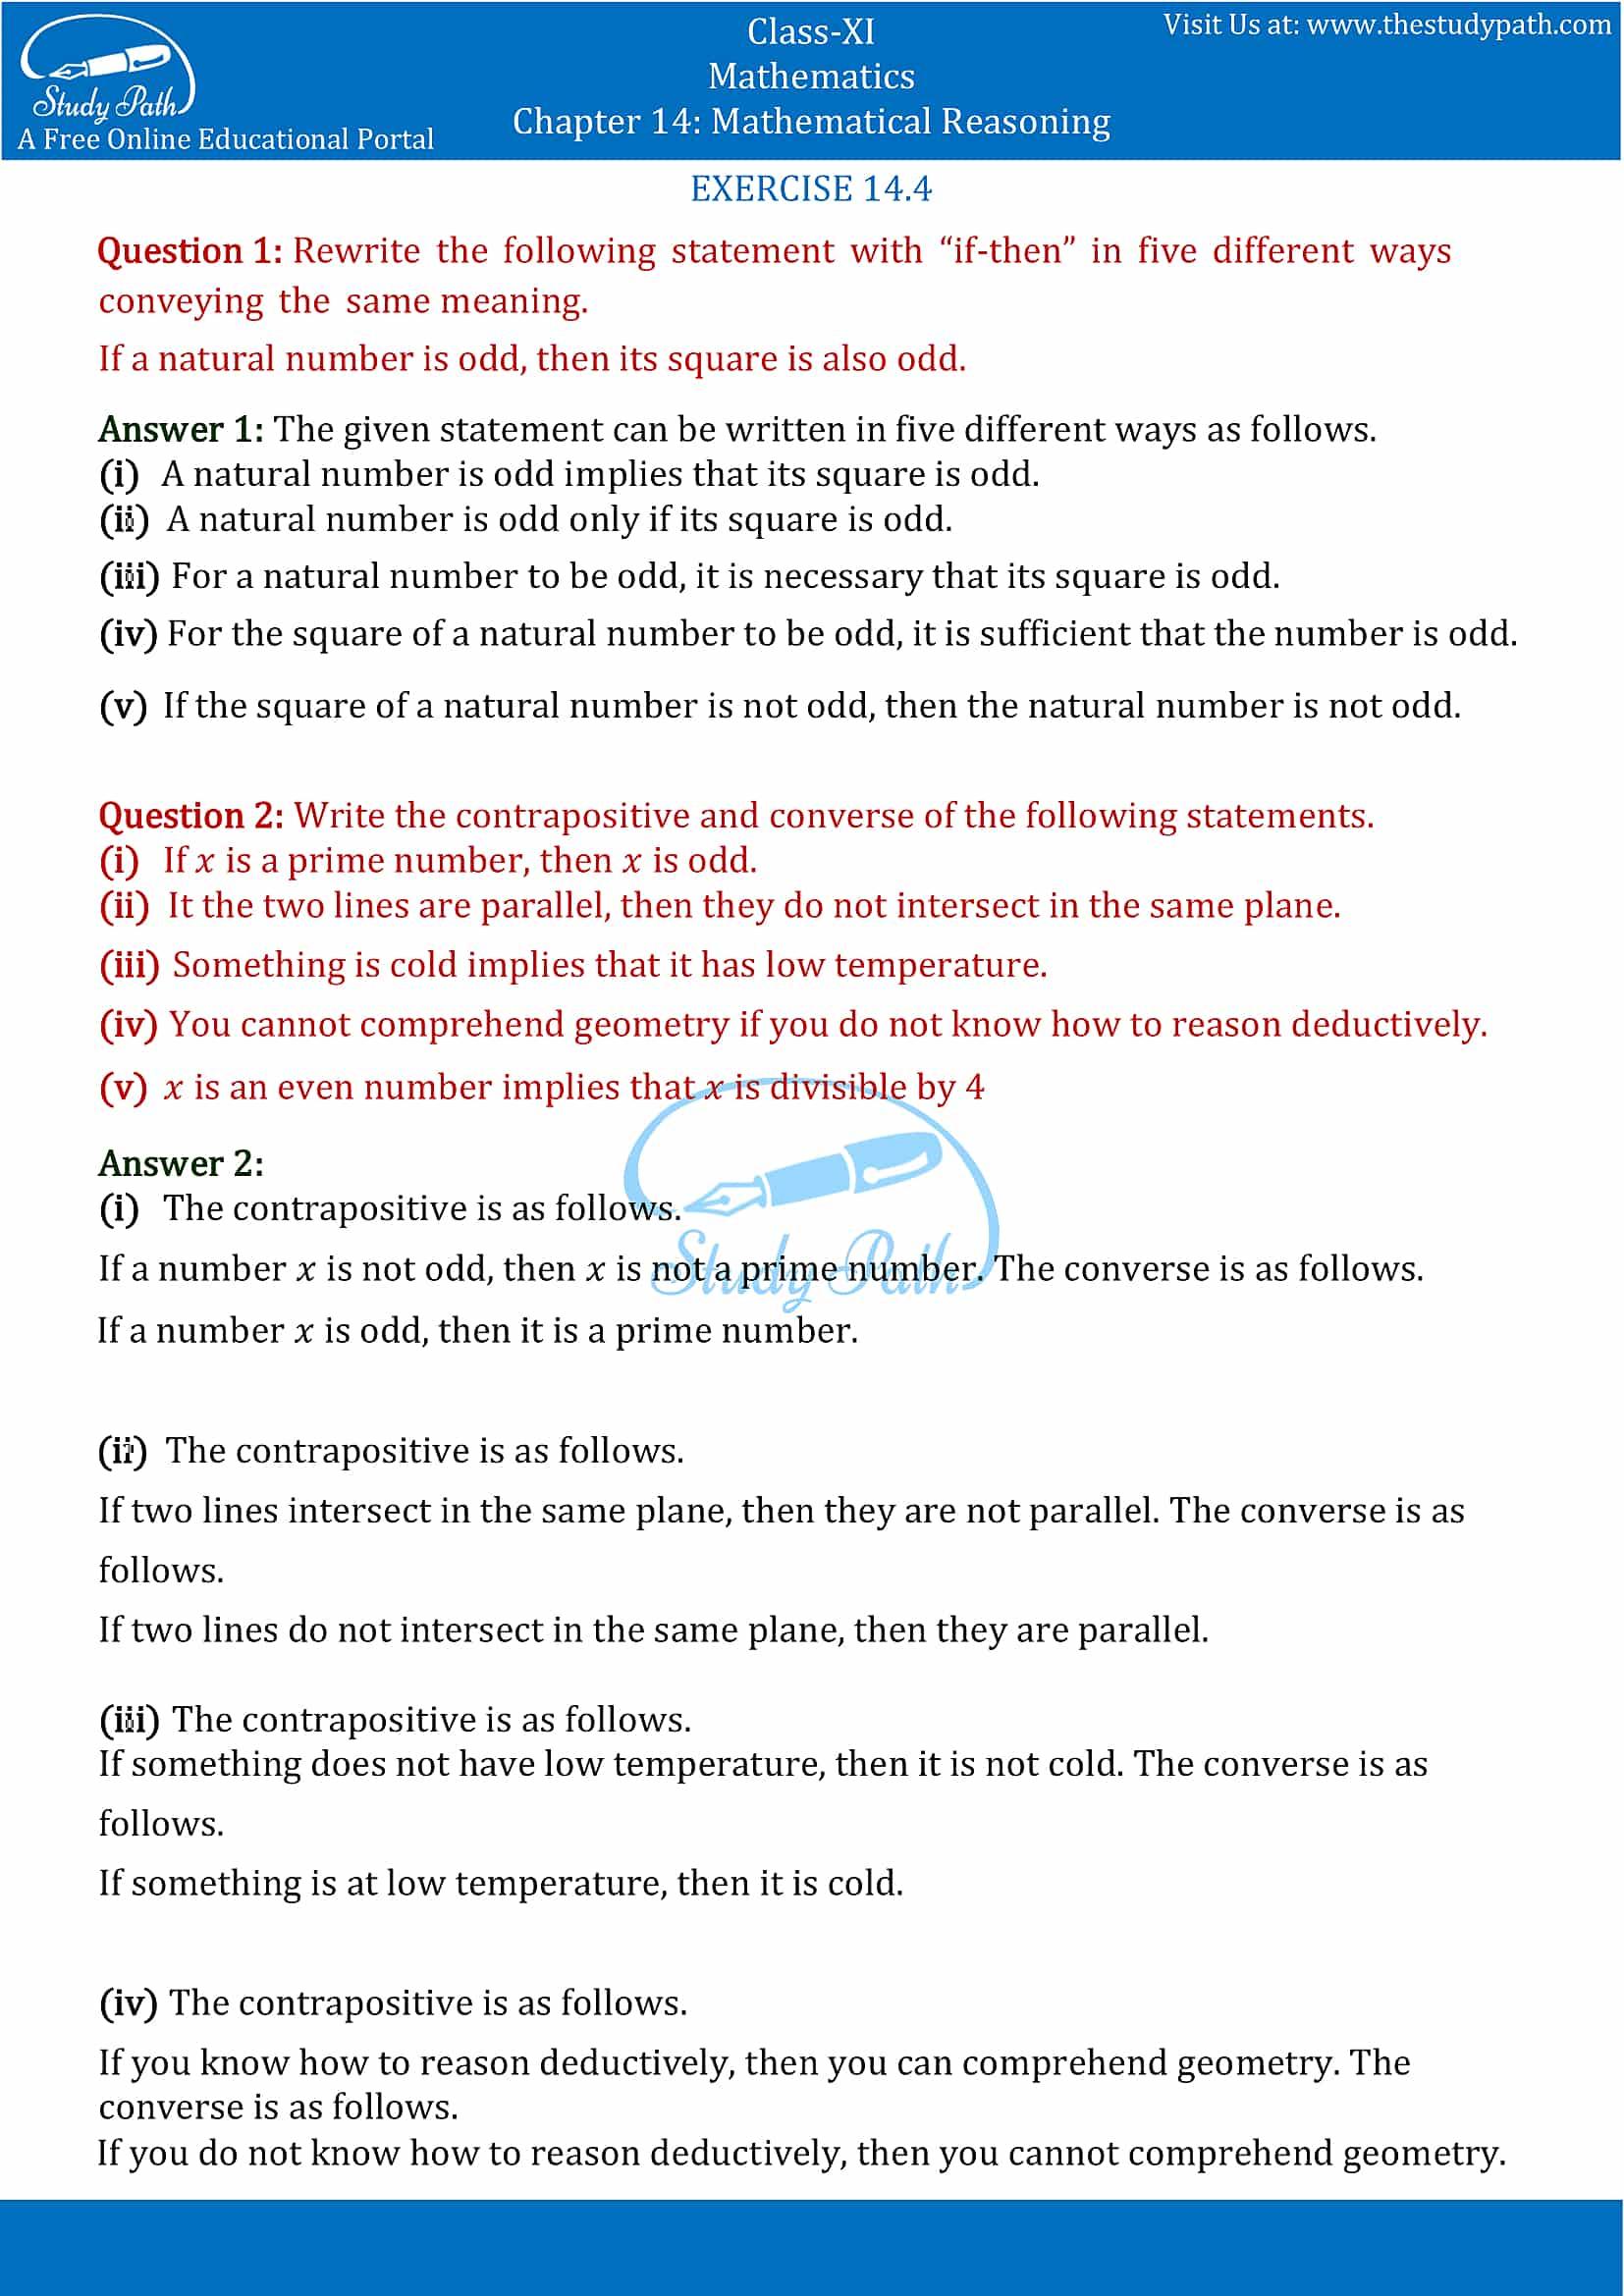 NCERT Solutions for Class 11 Maths Chapter 14 Mathematical Reasoning Part 7